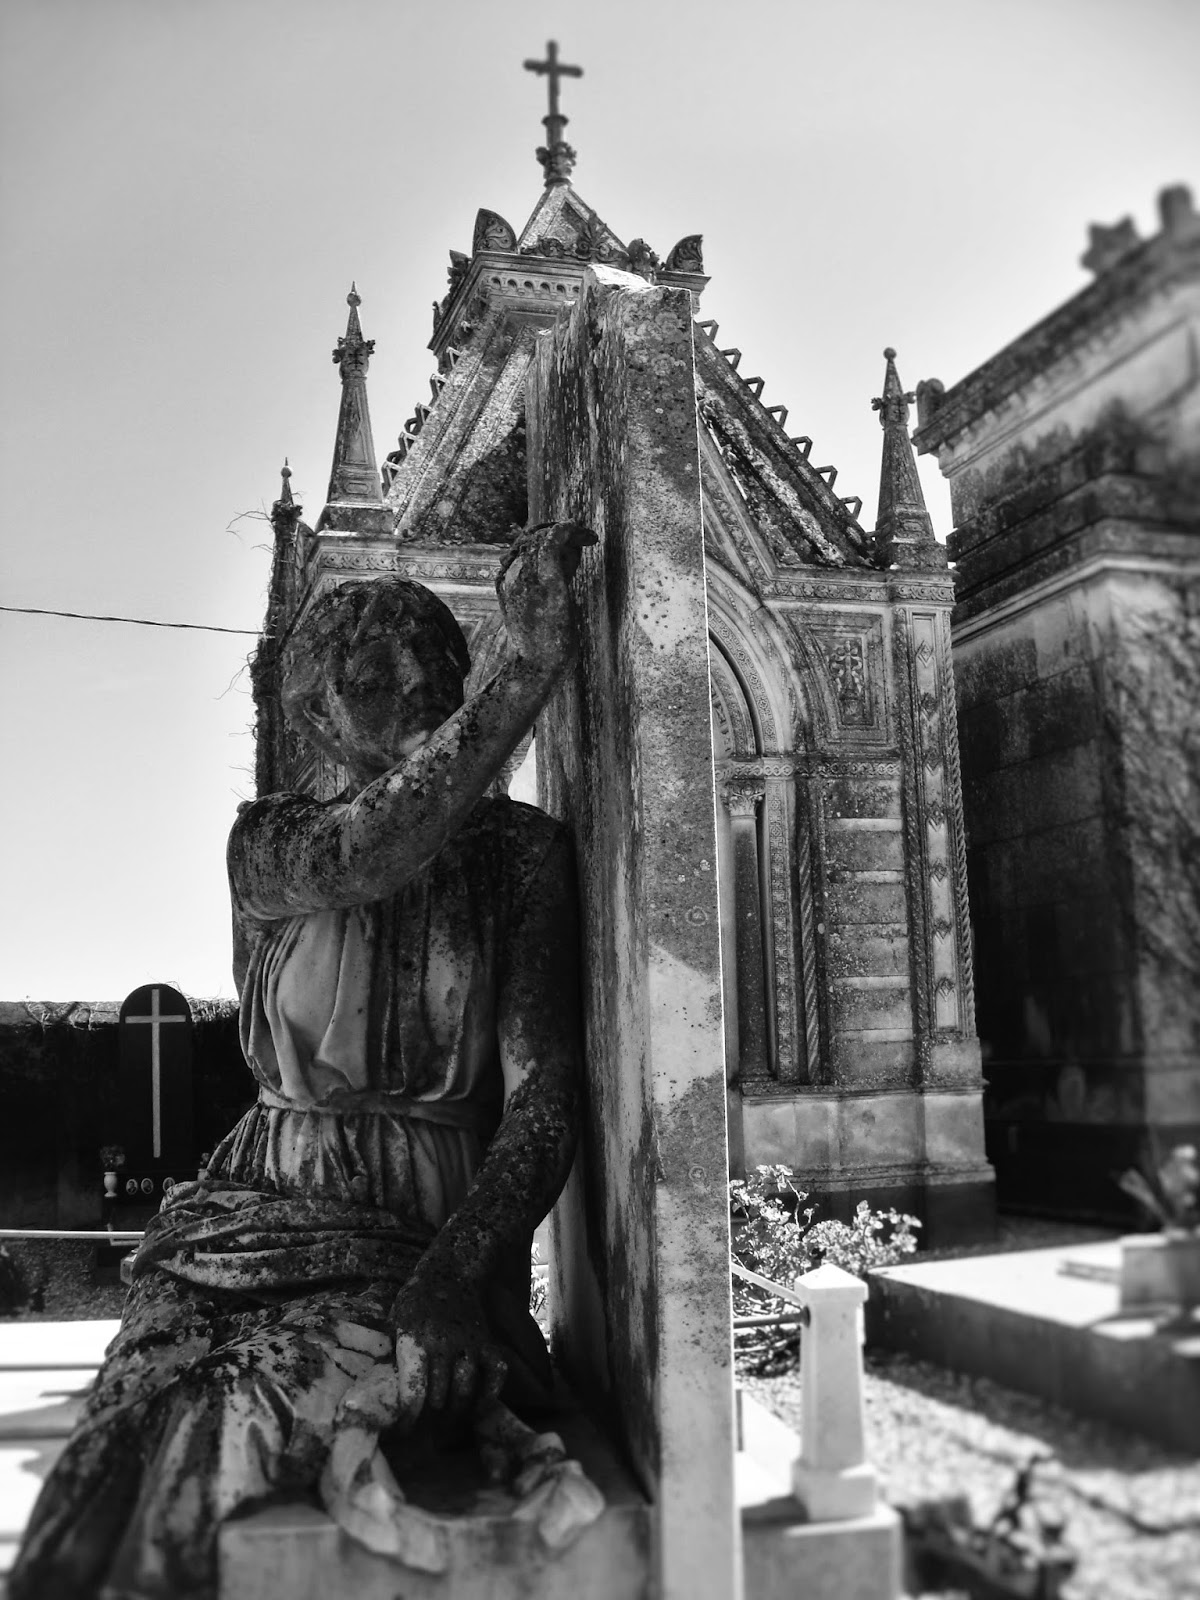 Cimitero Monumentale di Mascalucia